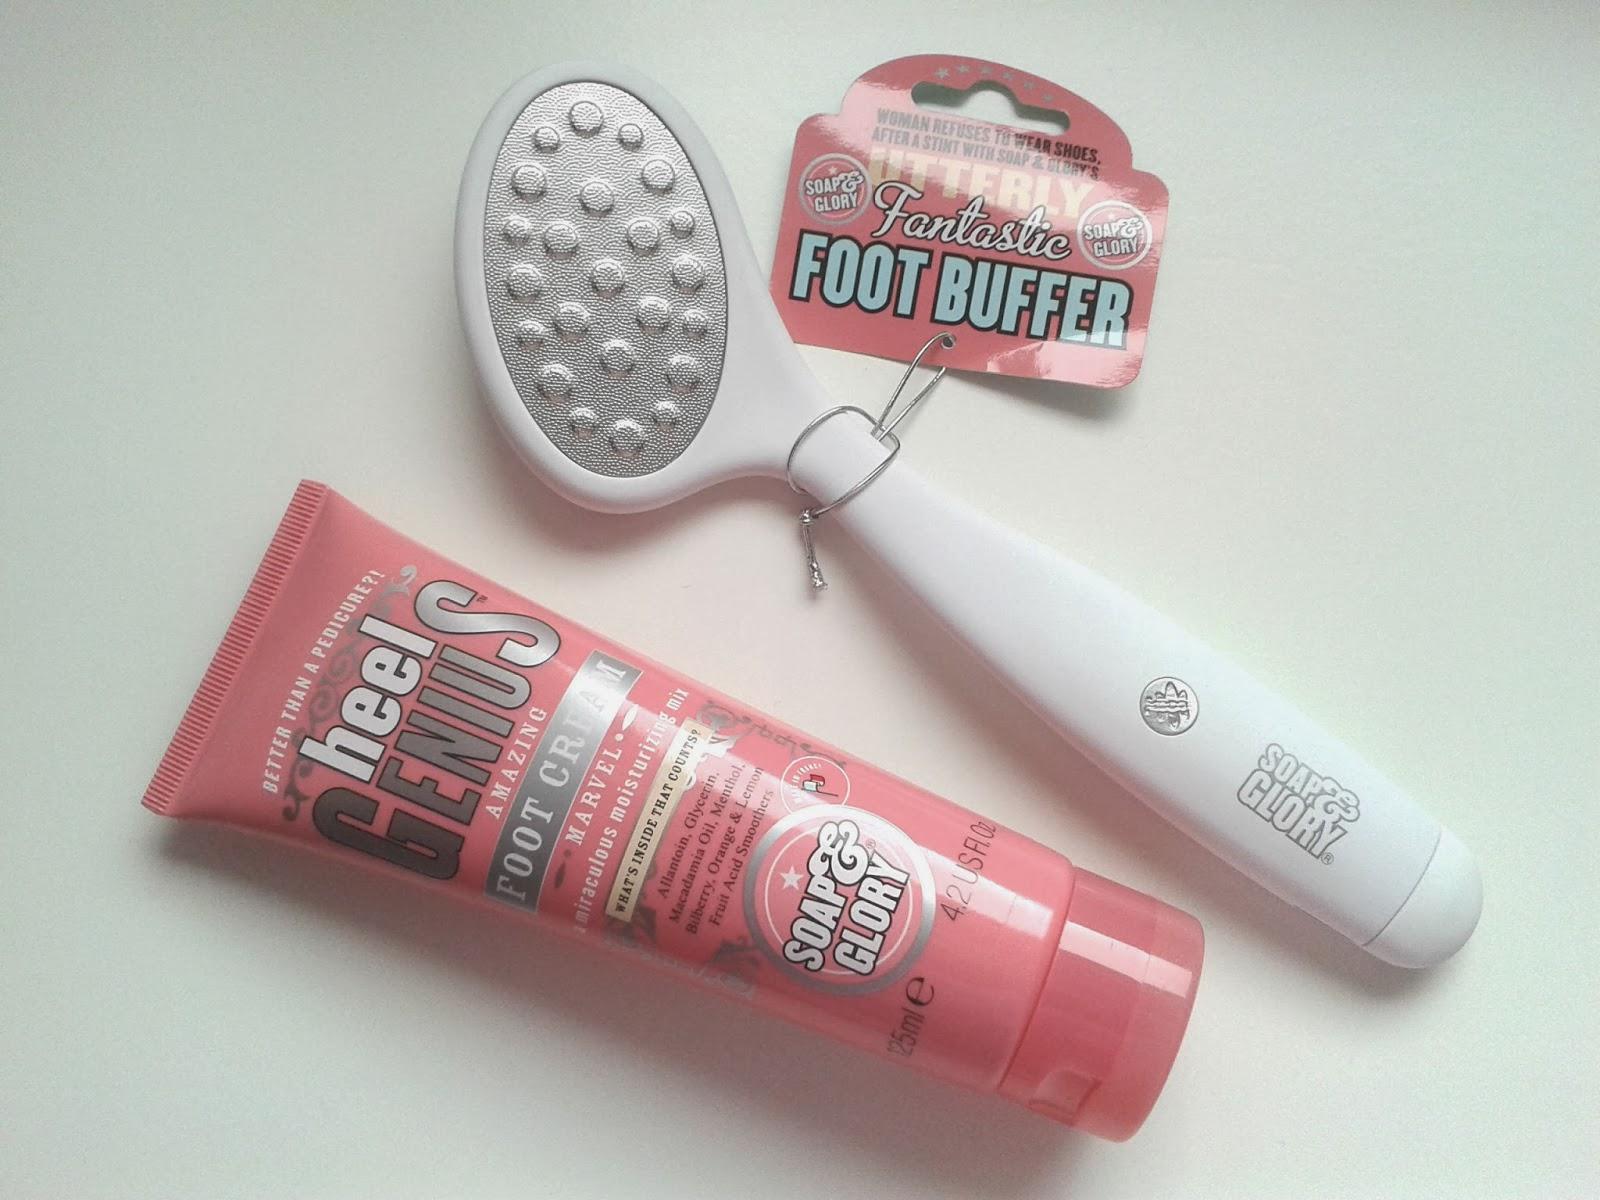 Soap & Glory Heel Genius Foot Buffer Review